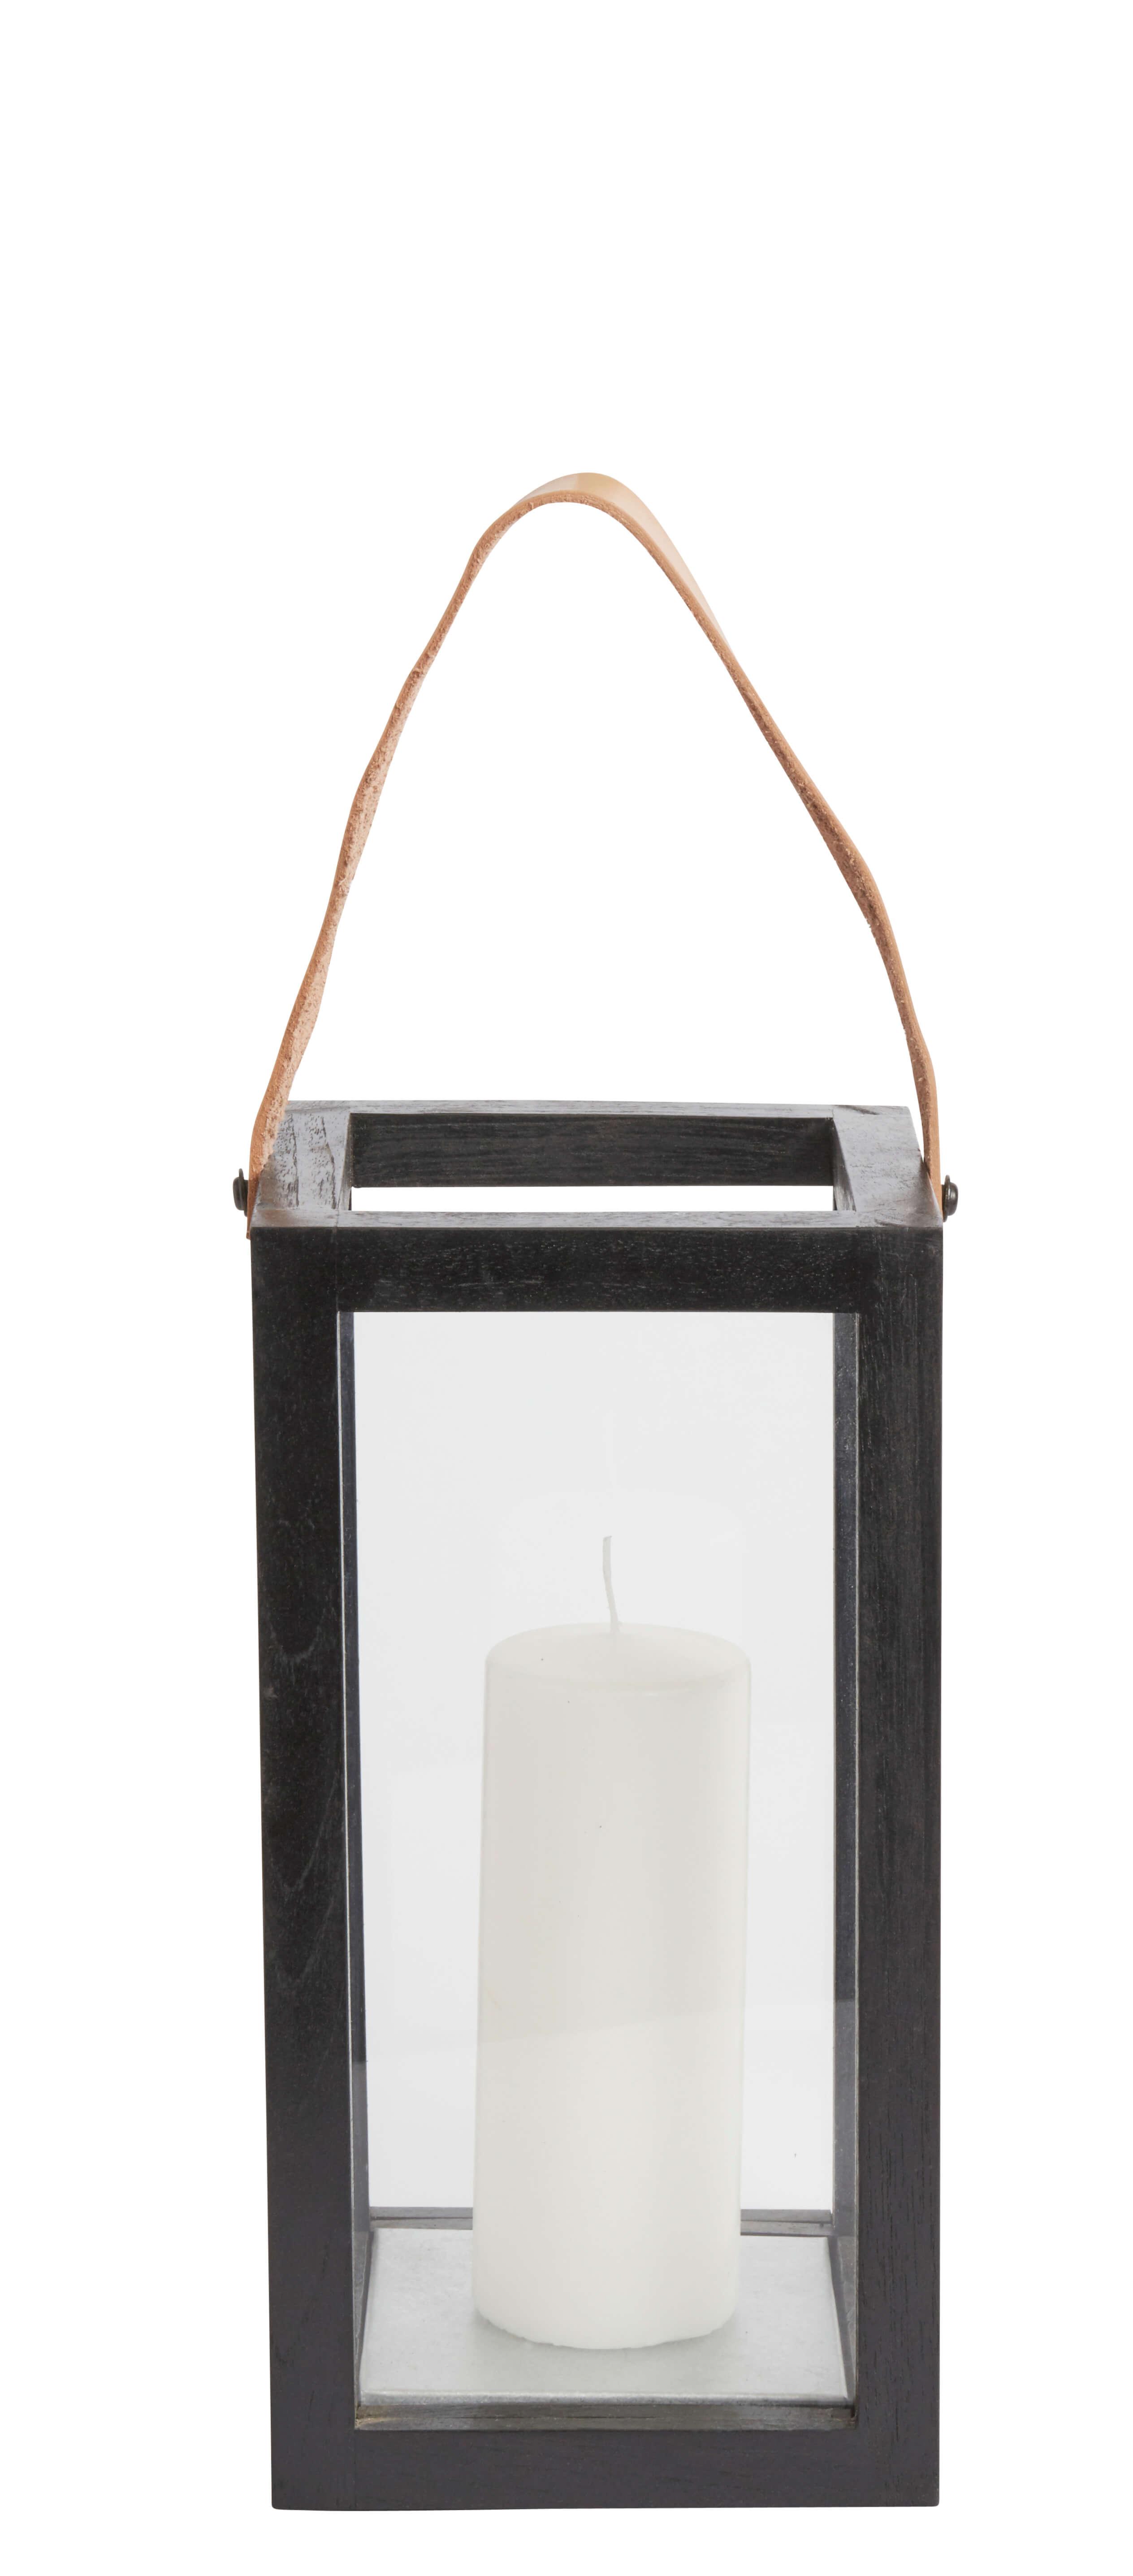 Muubs - Lantern Small - Black Recycled Teak (1121527502)